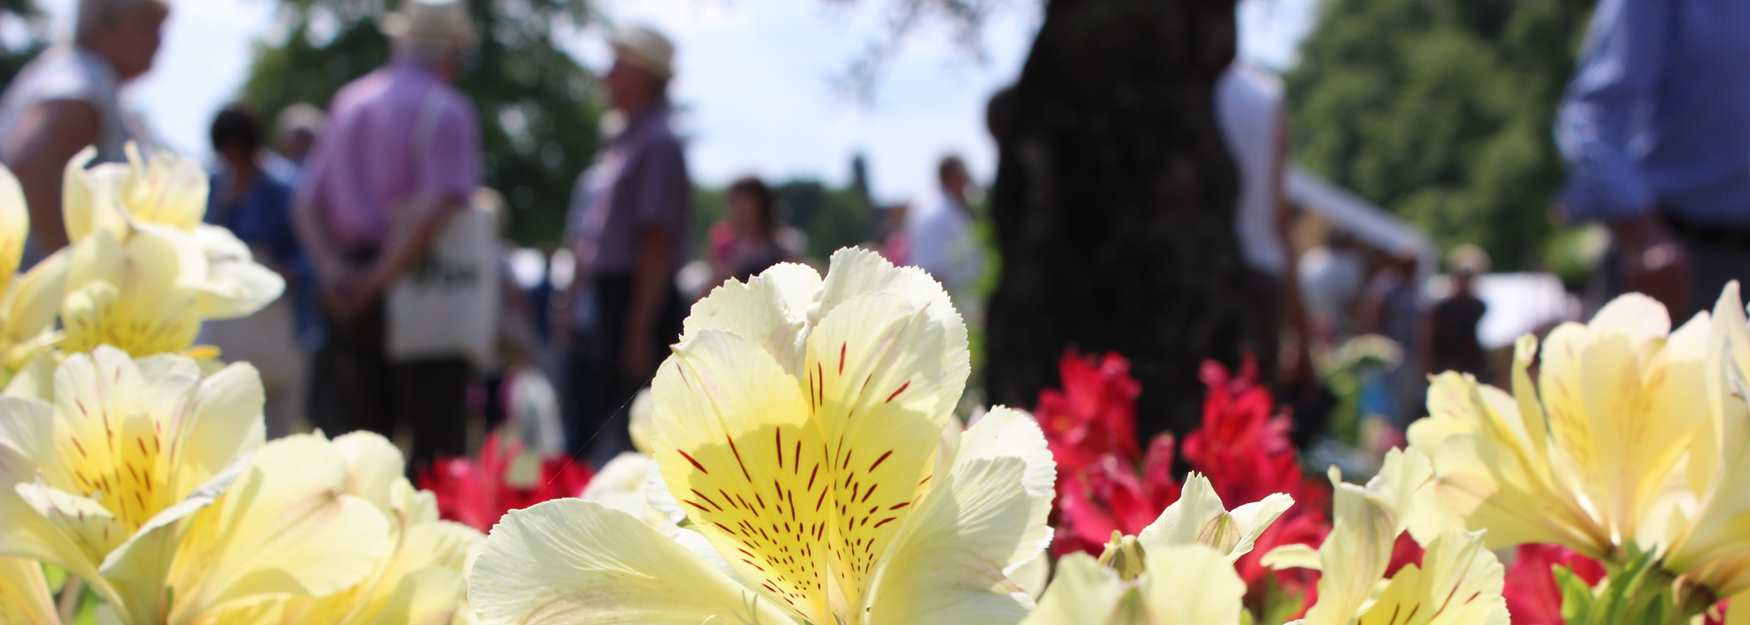 Blenheim Flower Show